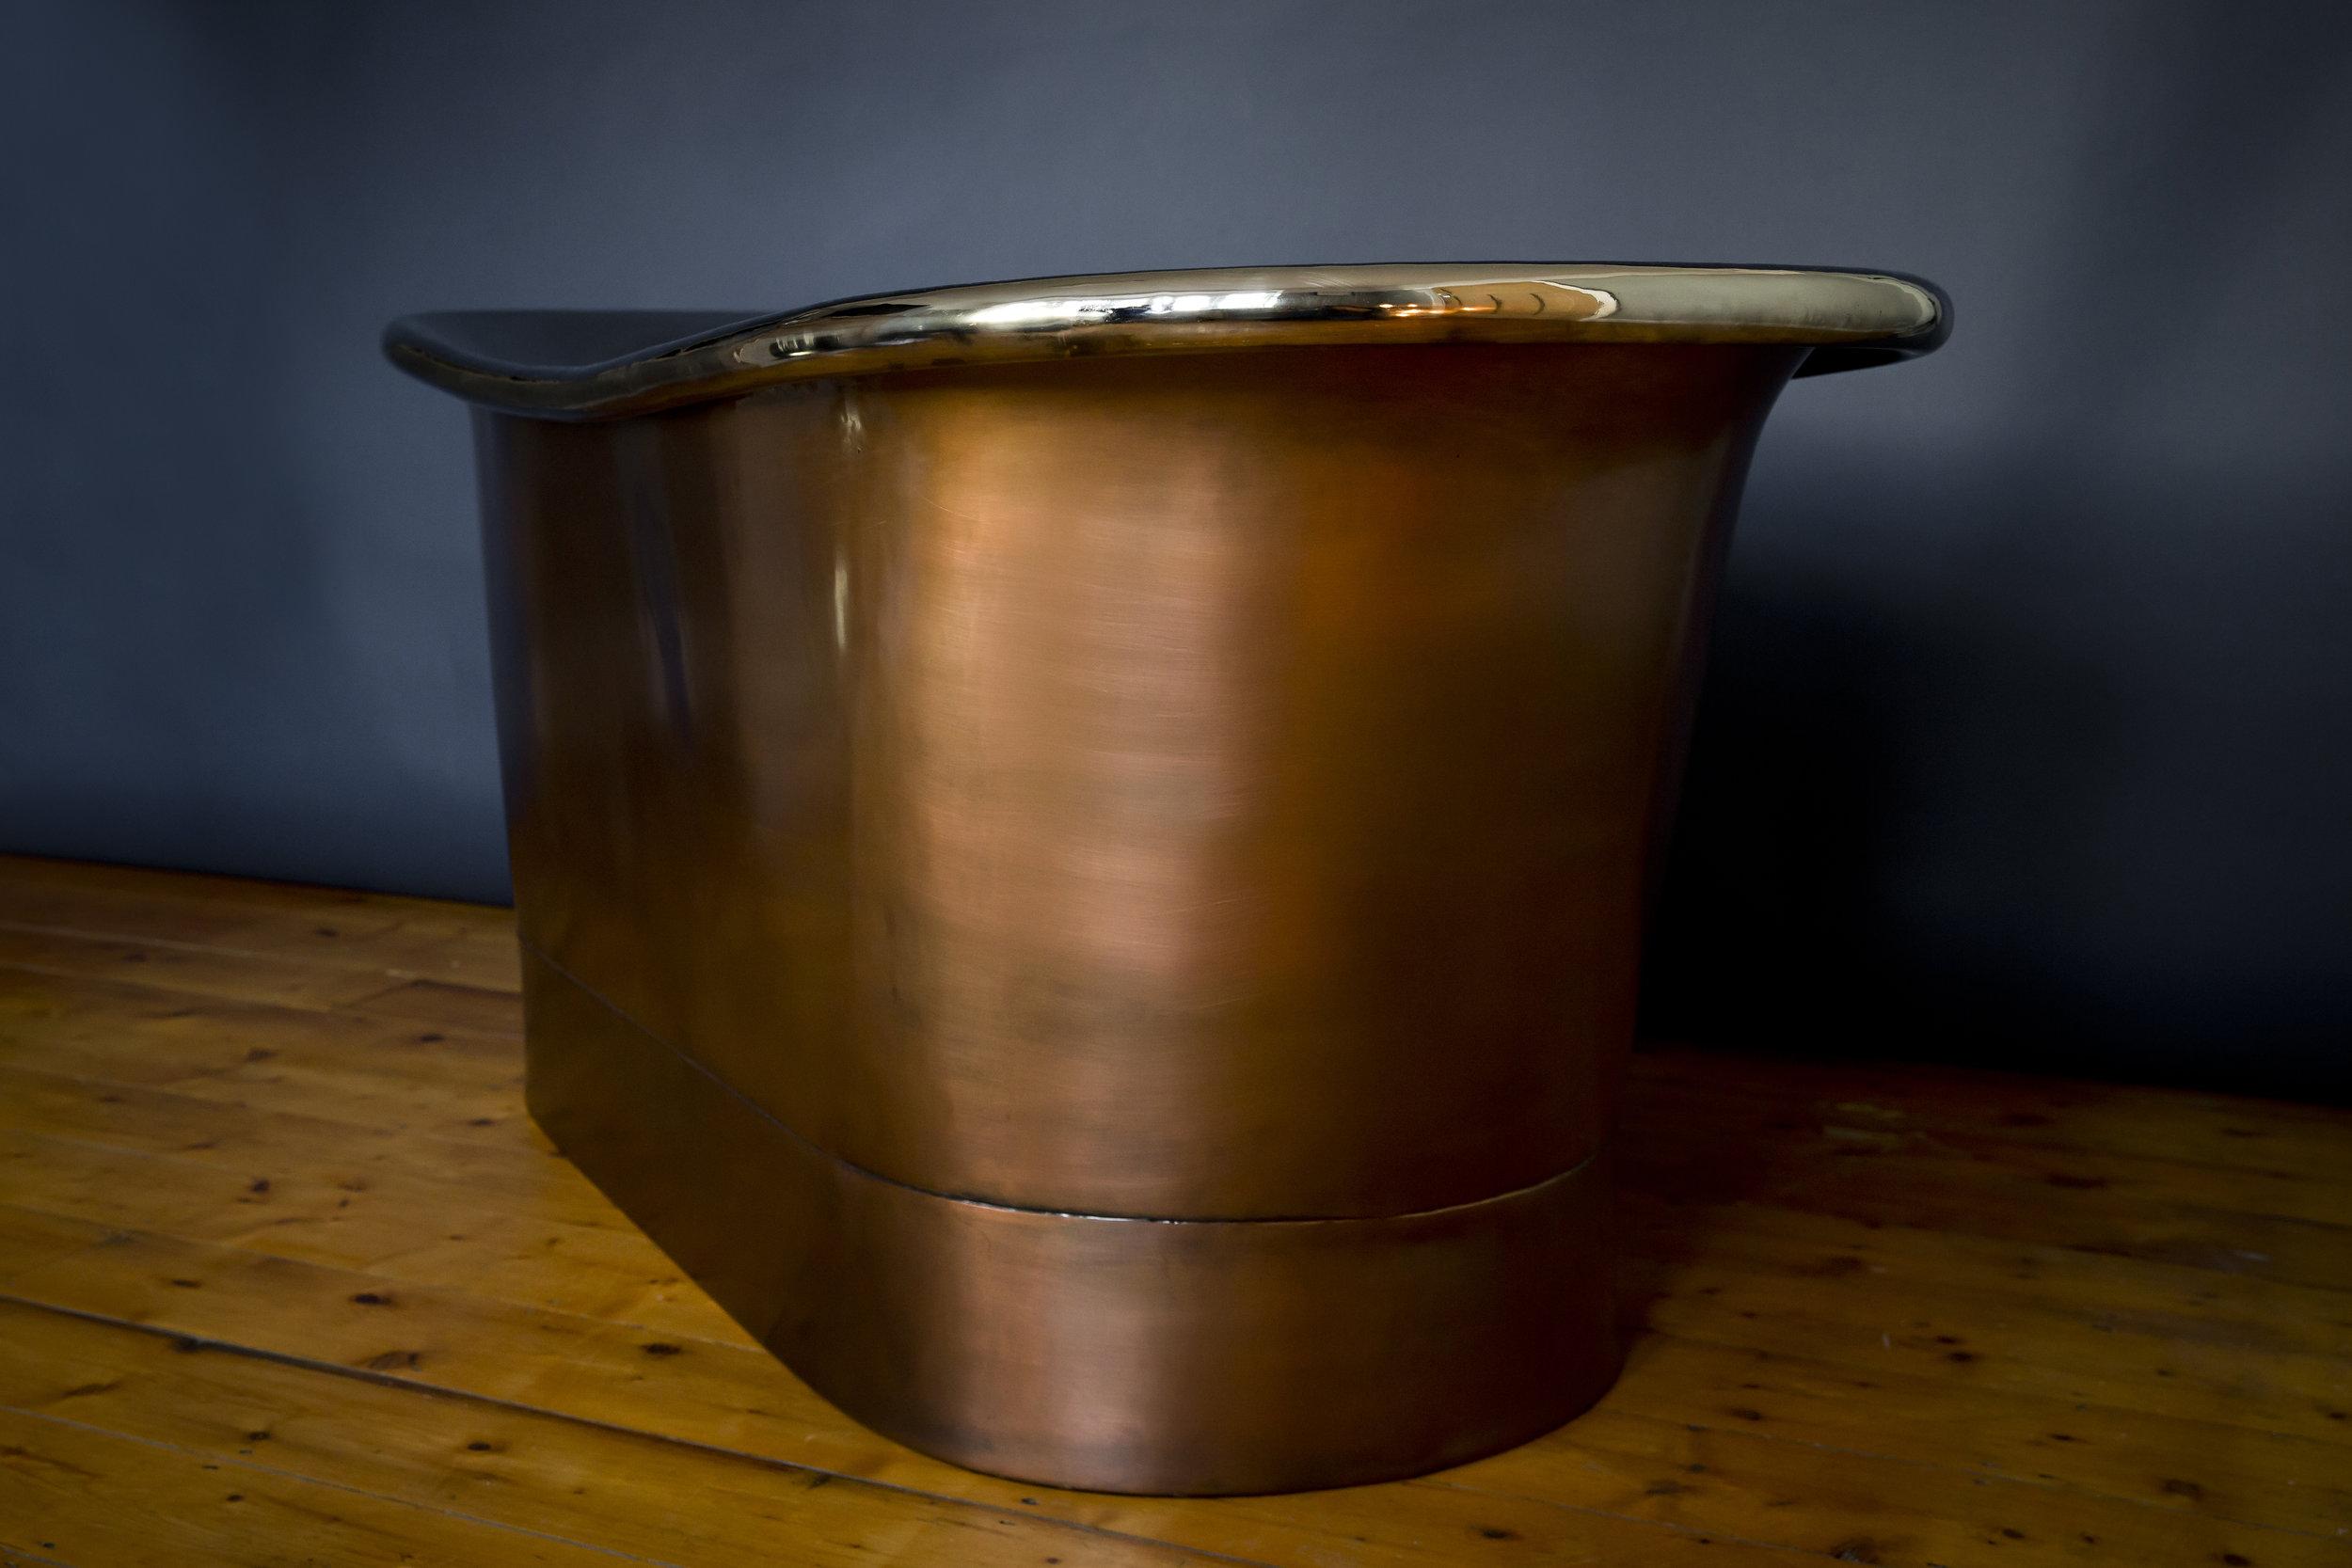 Copper Bath09.jpg